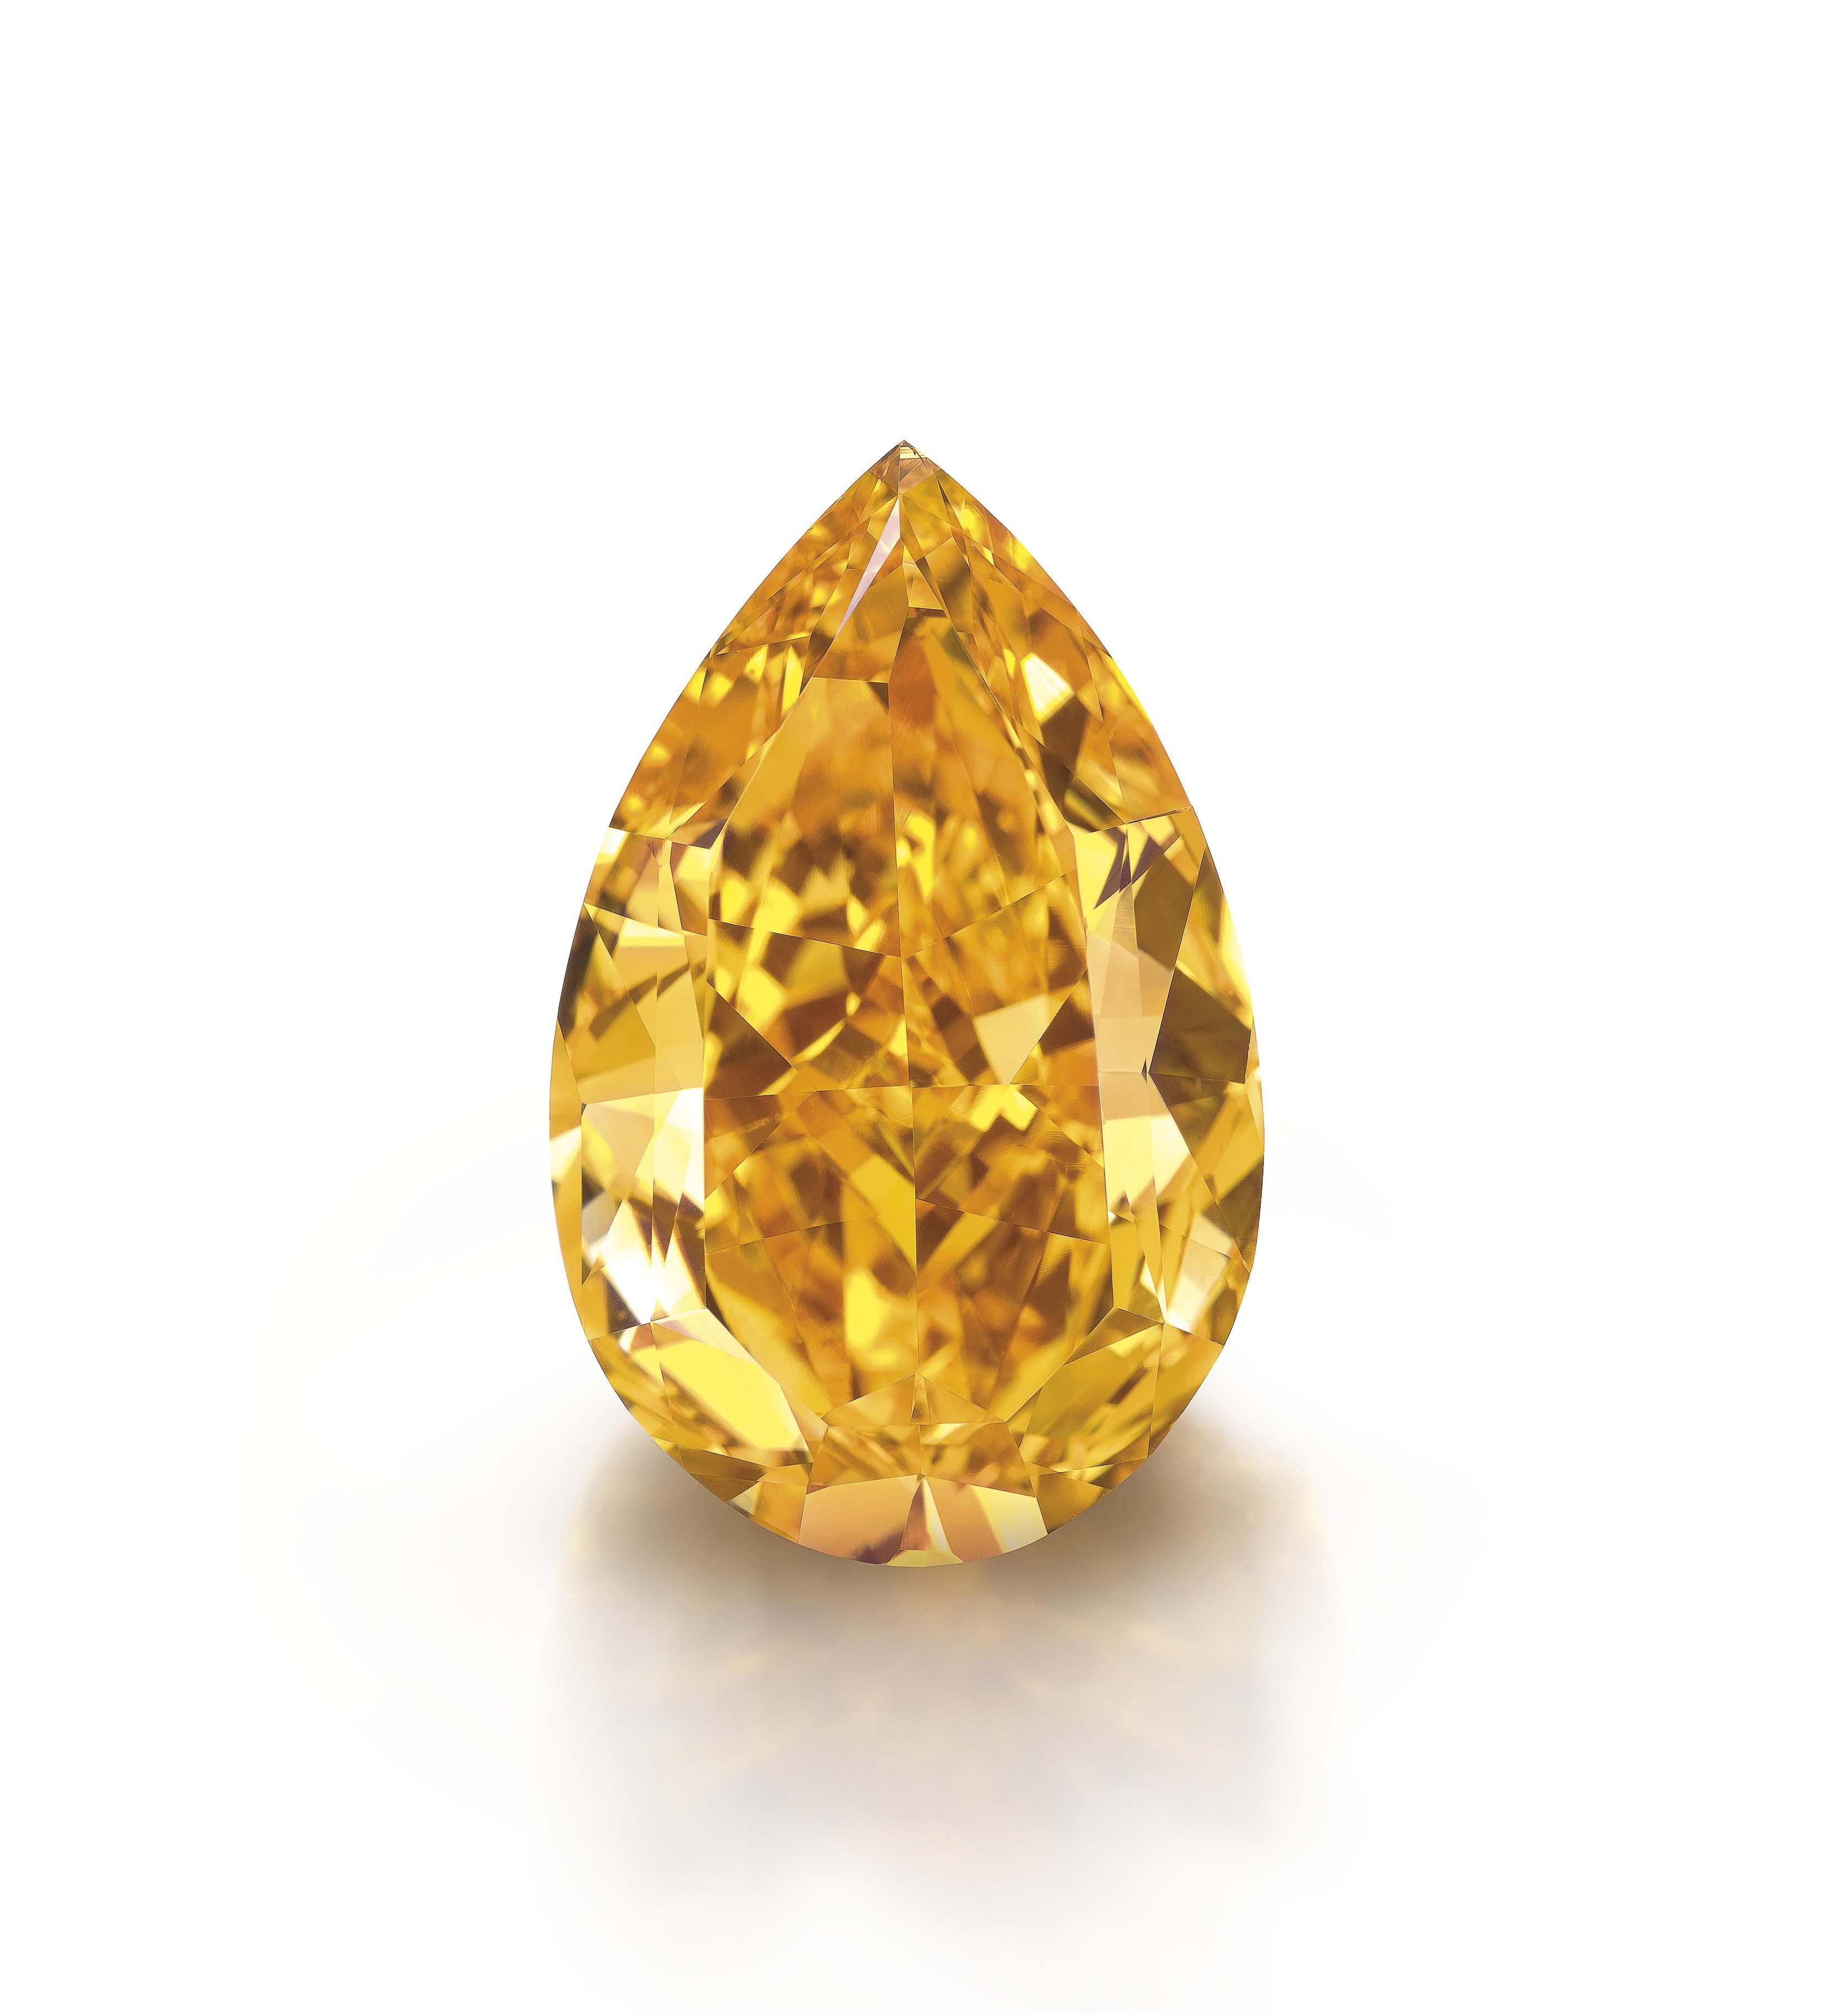 THE ORANGE: THE LARGEST FANCY VIVID ORANGE DIAMOND IN THE WORLD